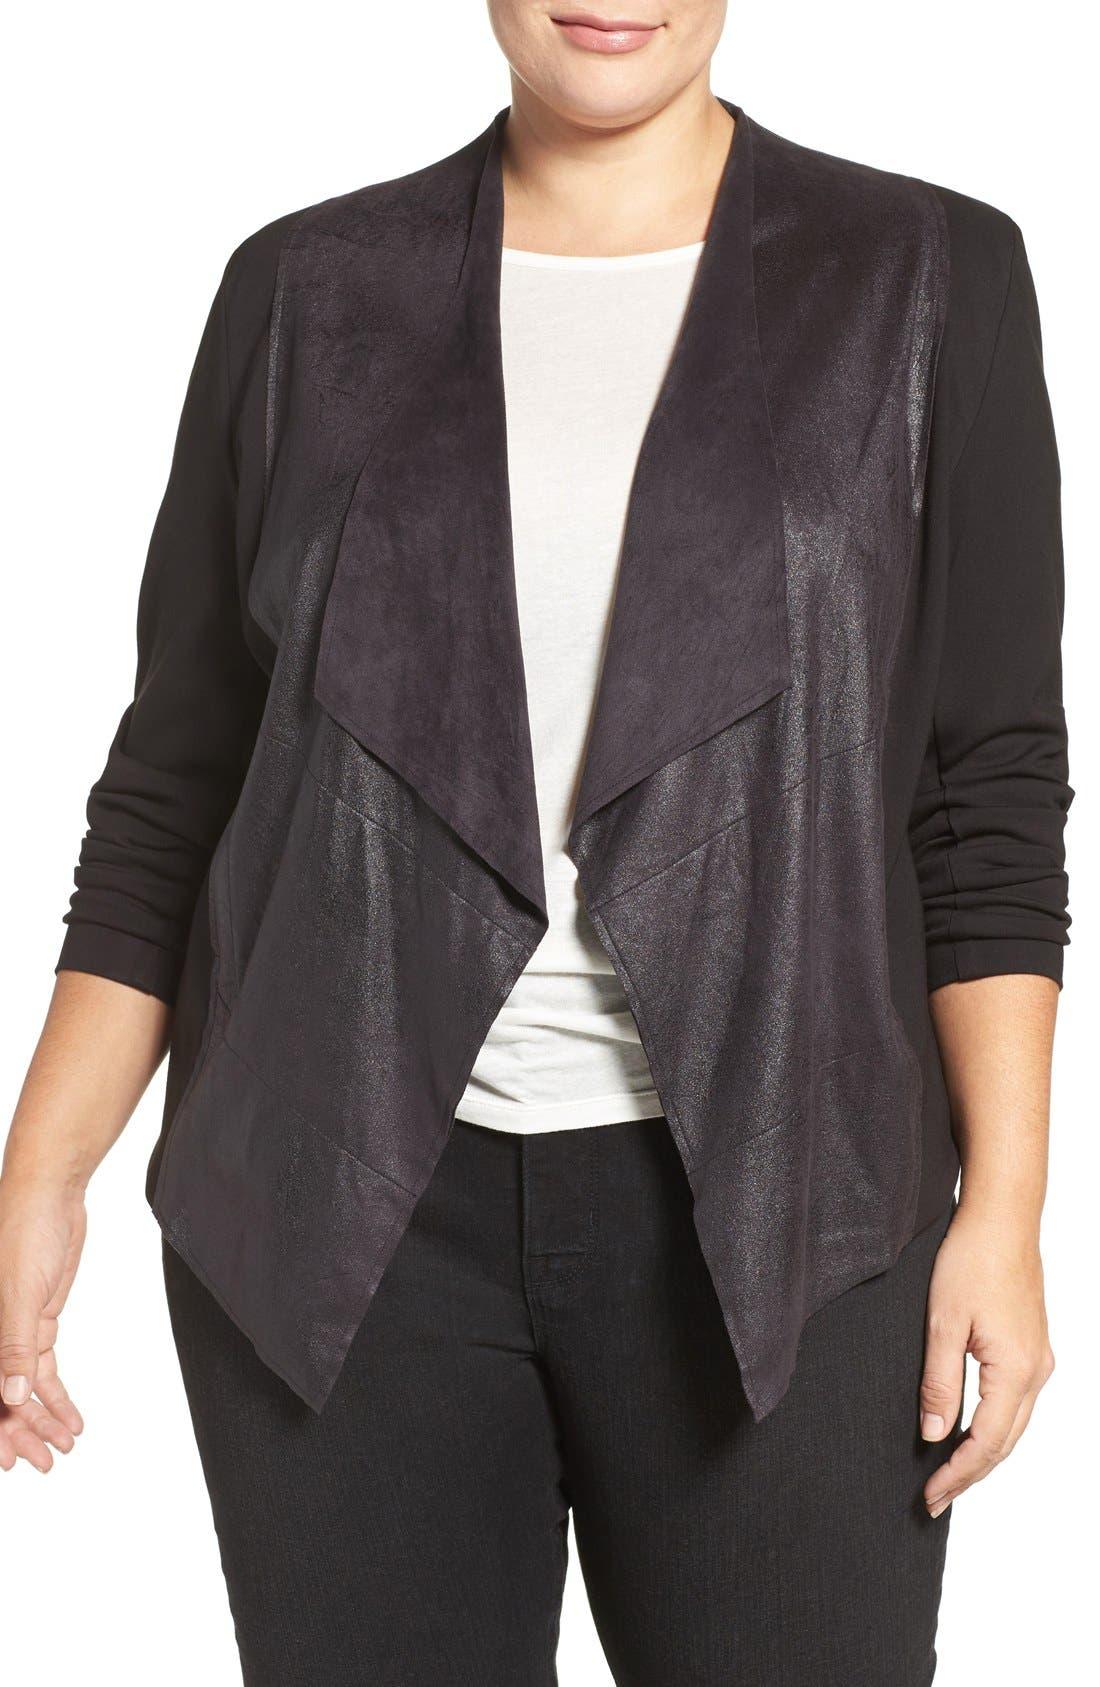 'Shanan' Faux Leather & Knit Drape Front Jacket,                         Main,                         color, 001